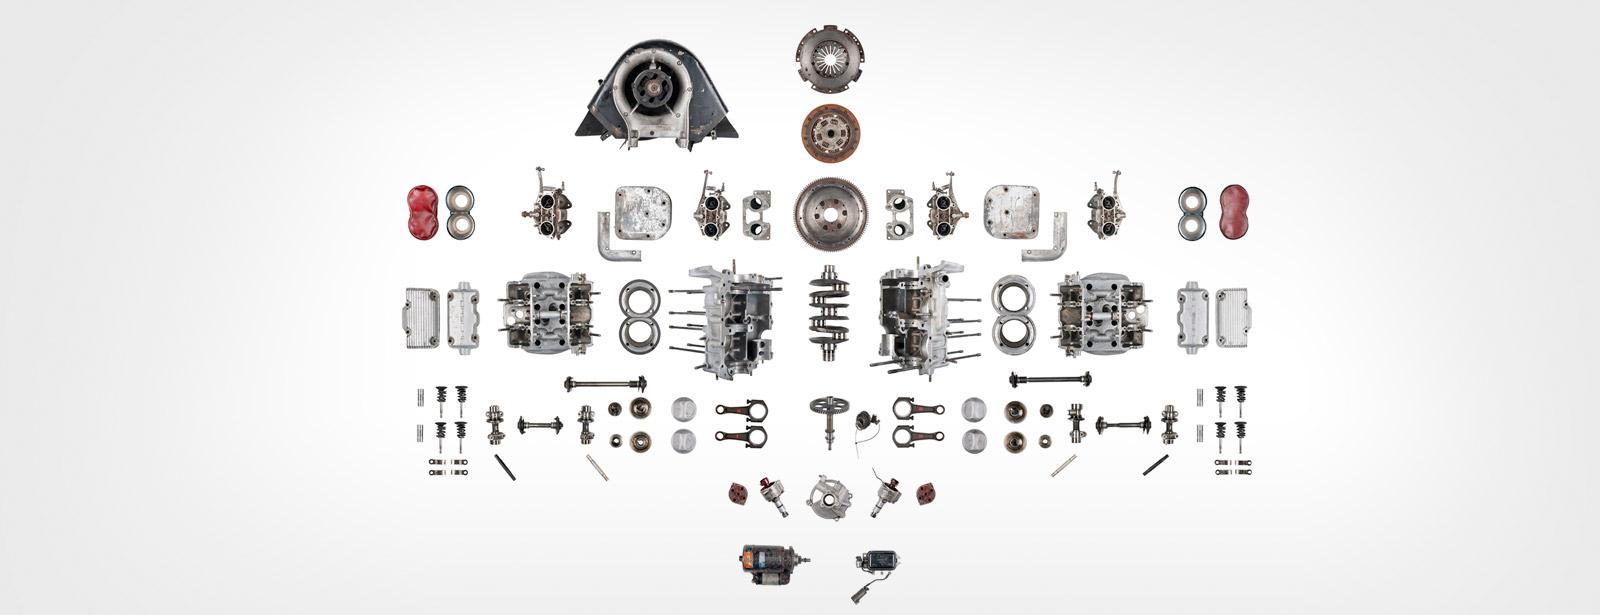 Porsche - Engine - Disassembly